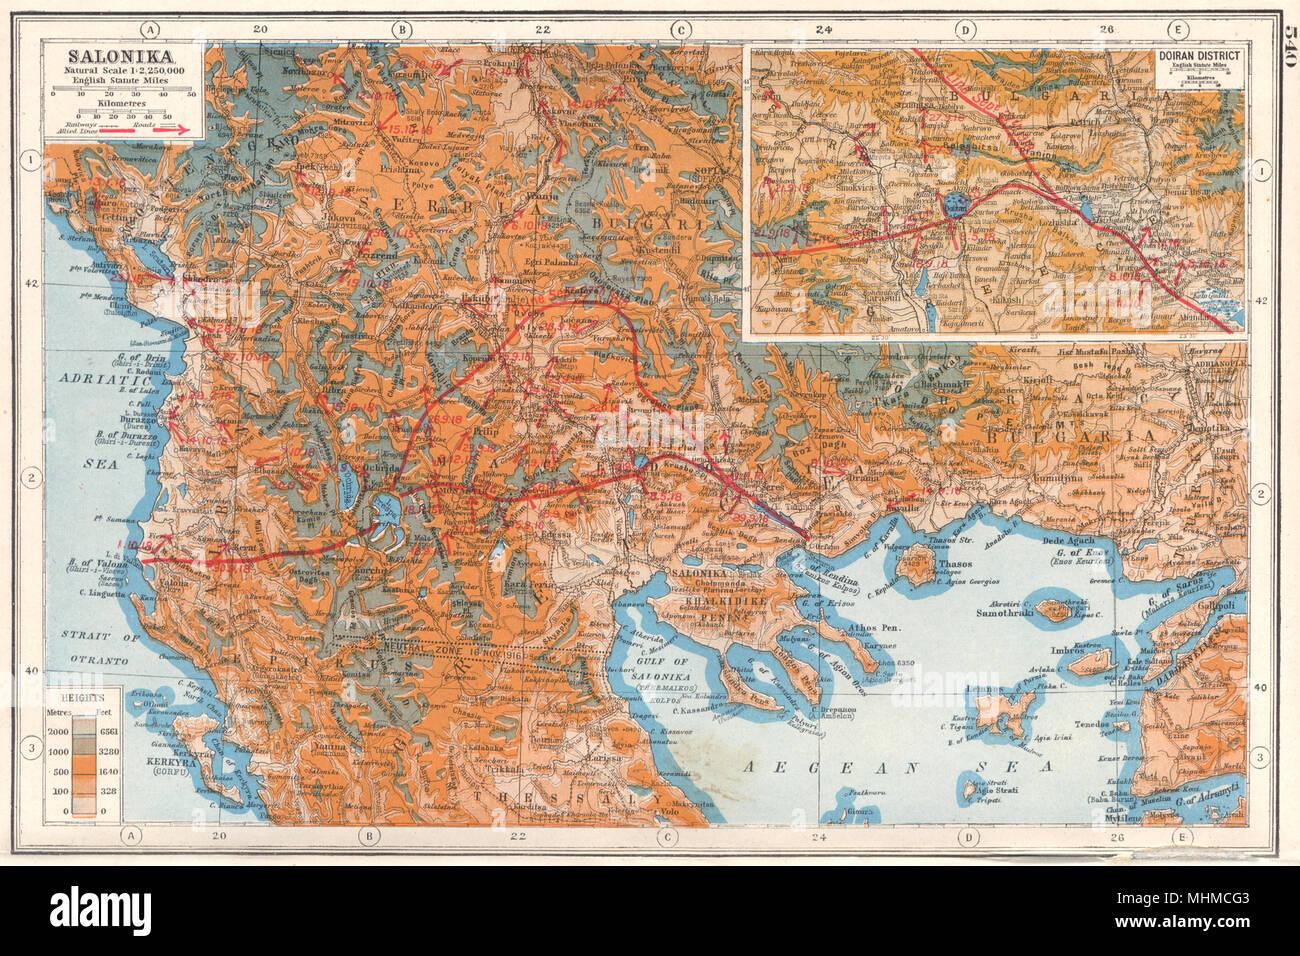 Thessaloniki Karte.Balkan Griechenland Thessaloniki Doiran Bezirk Weltkrieg 1